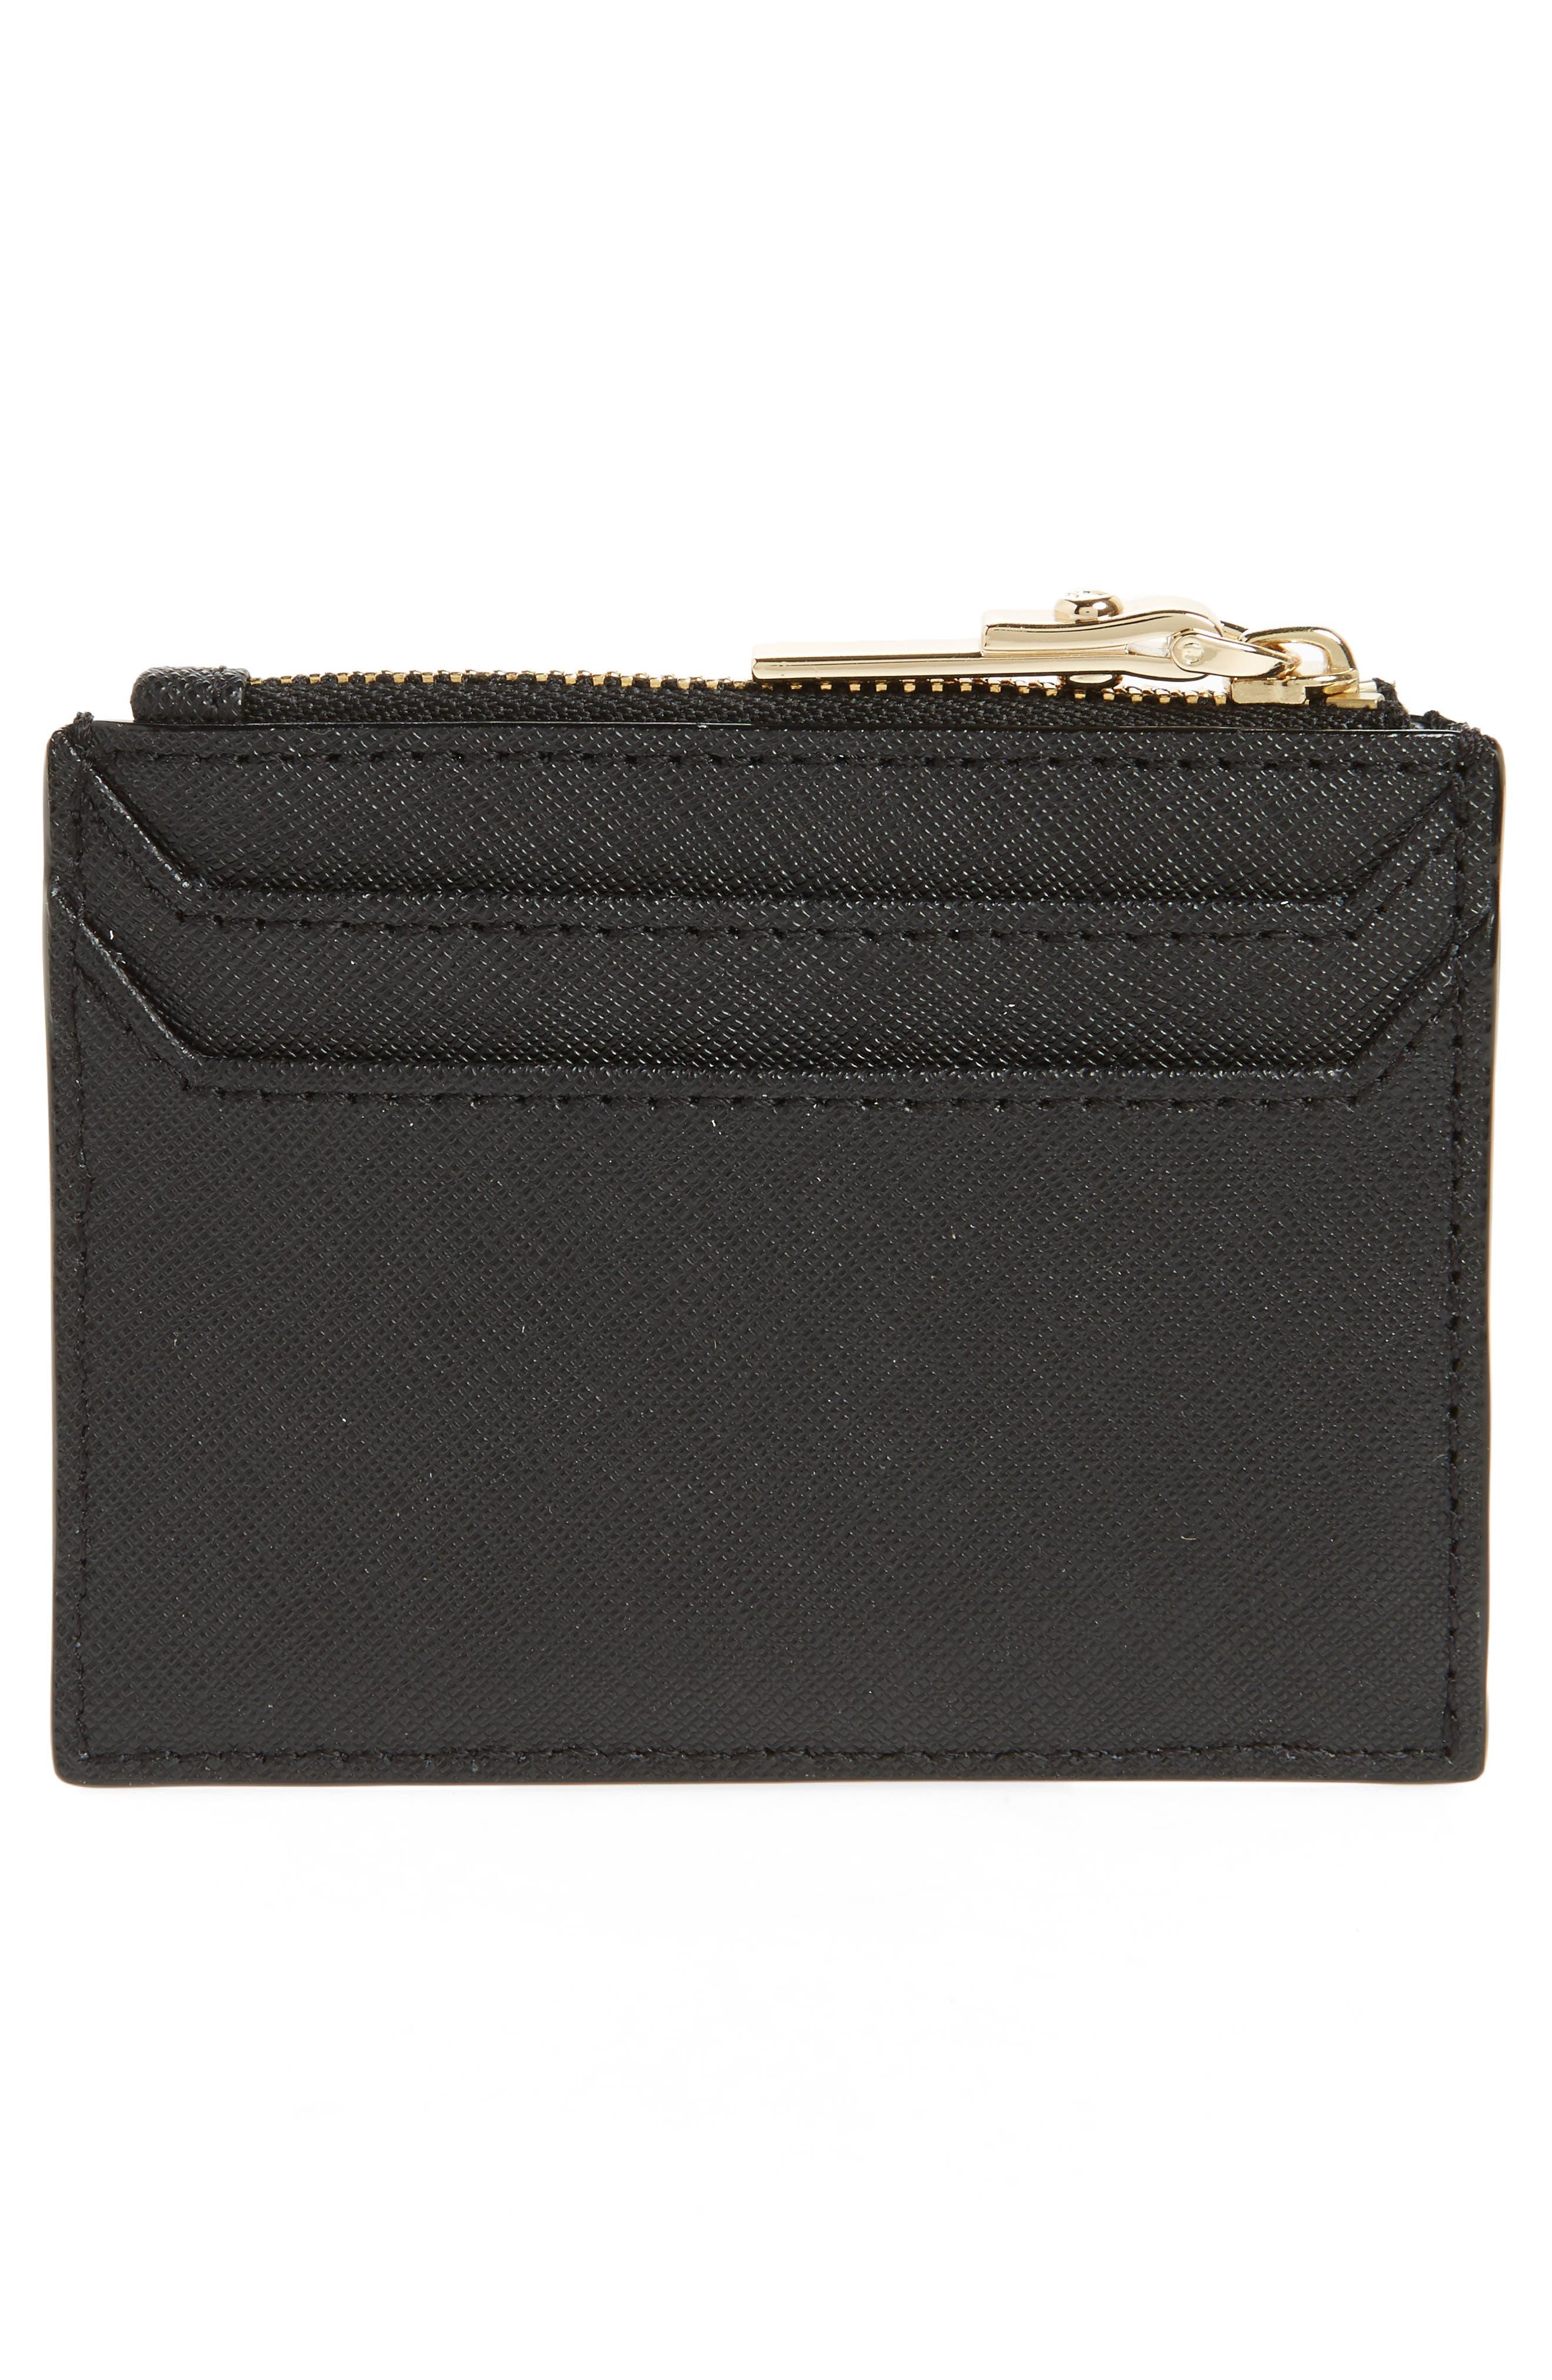 cameron street - lalena leather card case,                             Alternate thumbnail 2, color,                             Black